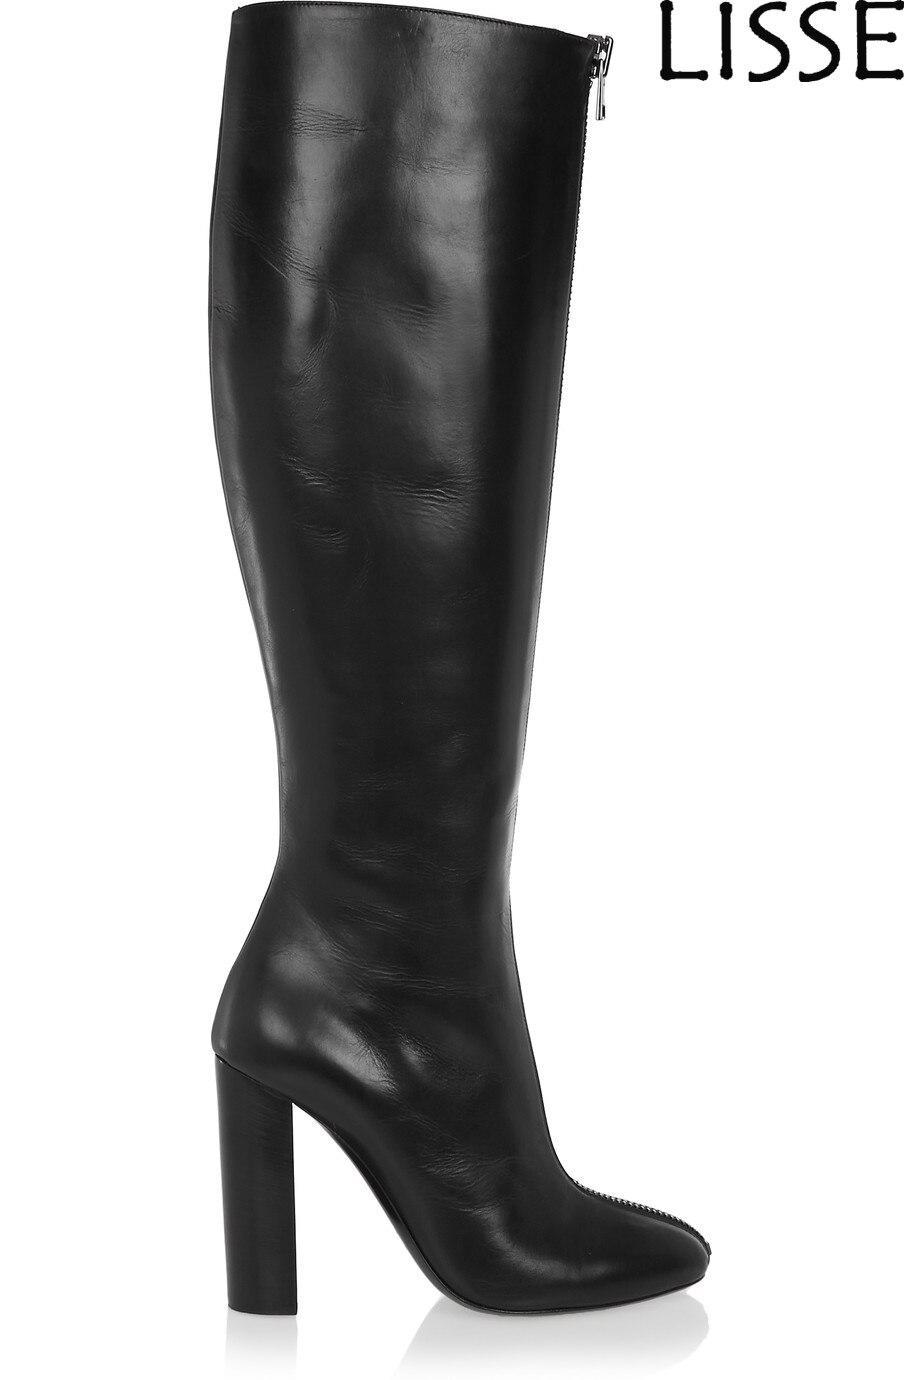 Fashion Women Round Toe Knee High Boots Chunky Heel Shoes Zipper Big Size 15 16 17 Winter Dress Knee Boots